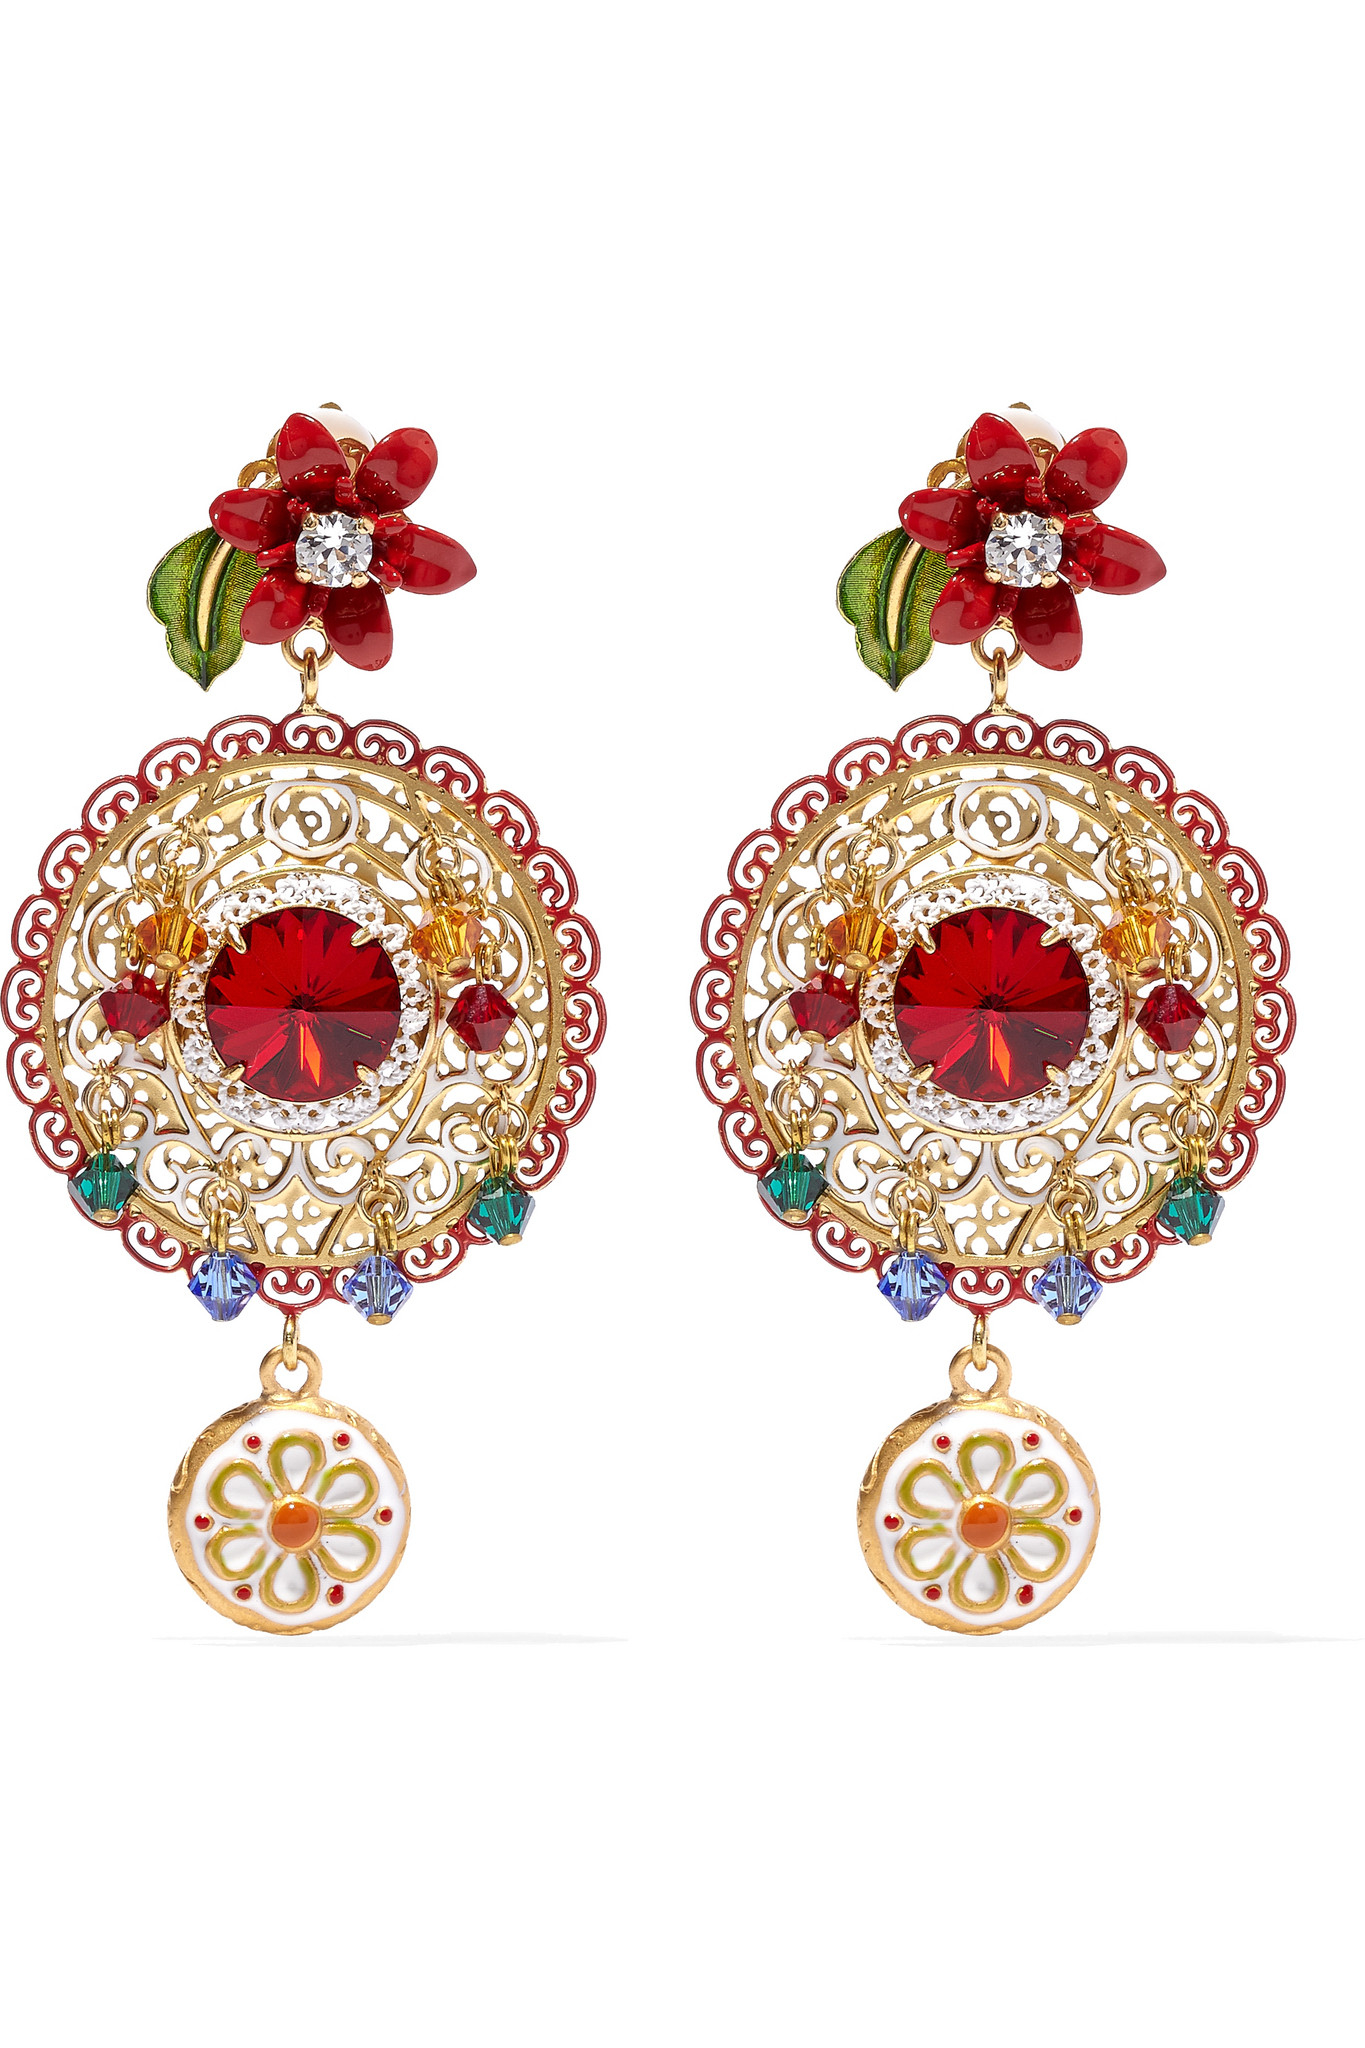 5b0141c16 Dolce & Gabbana Gold-plated Swarovski Crystal Clip Earrings in ...